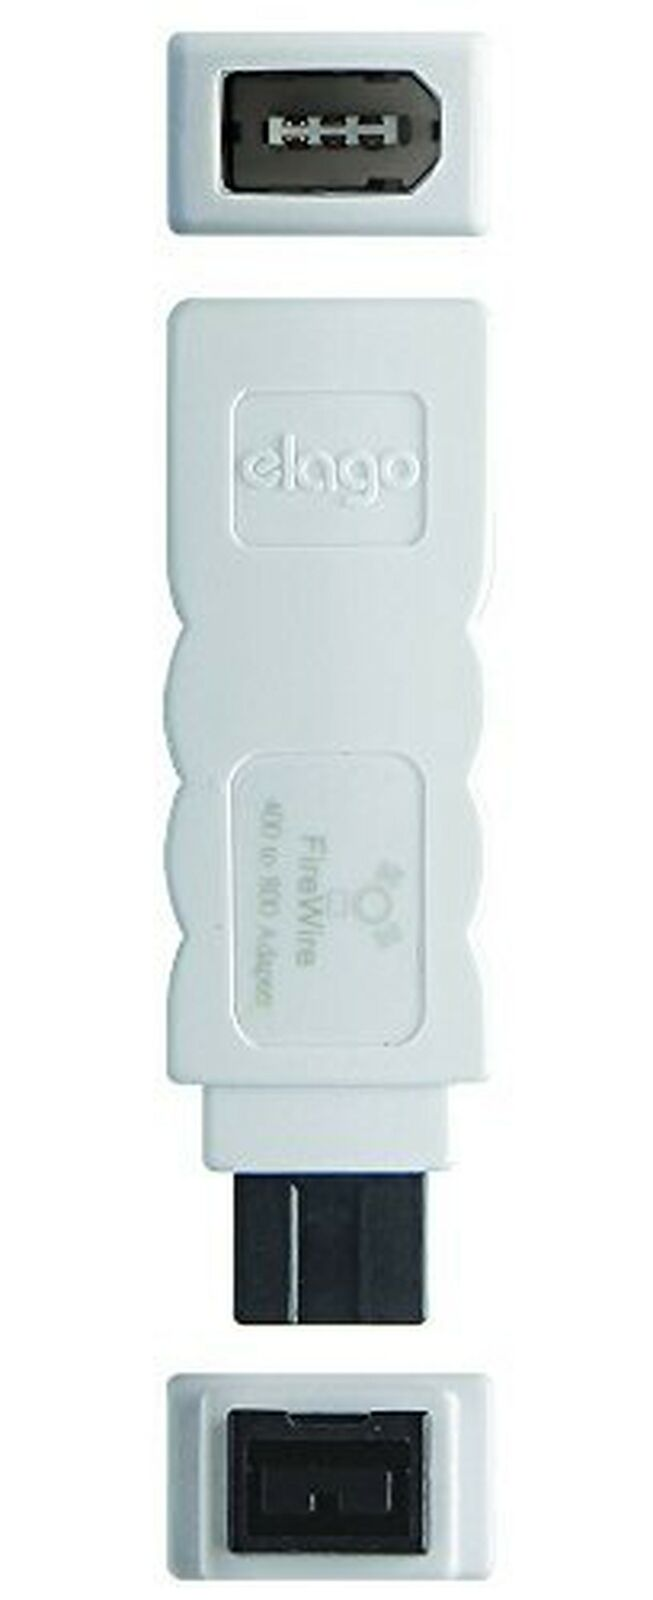 FireWire 400 to 800 Adapter - elago® FireWire Adapter [White]